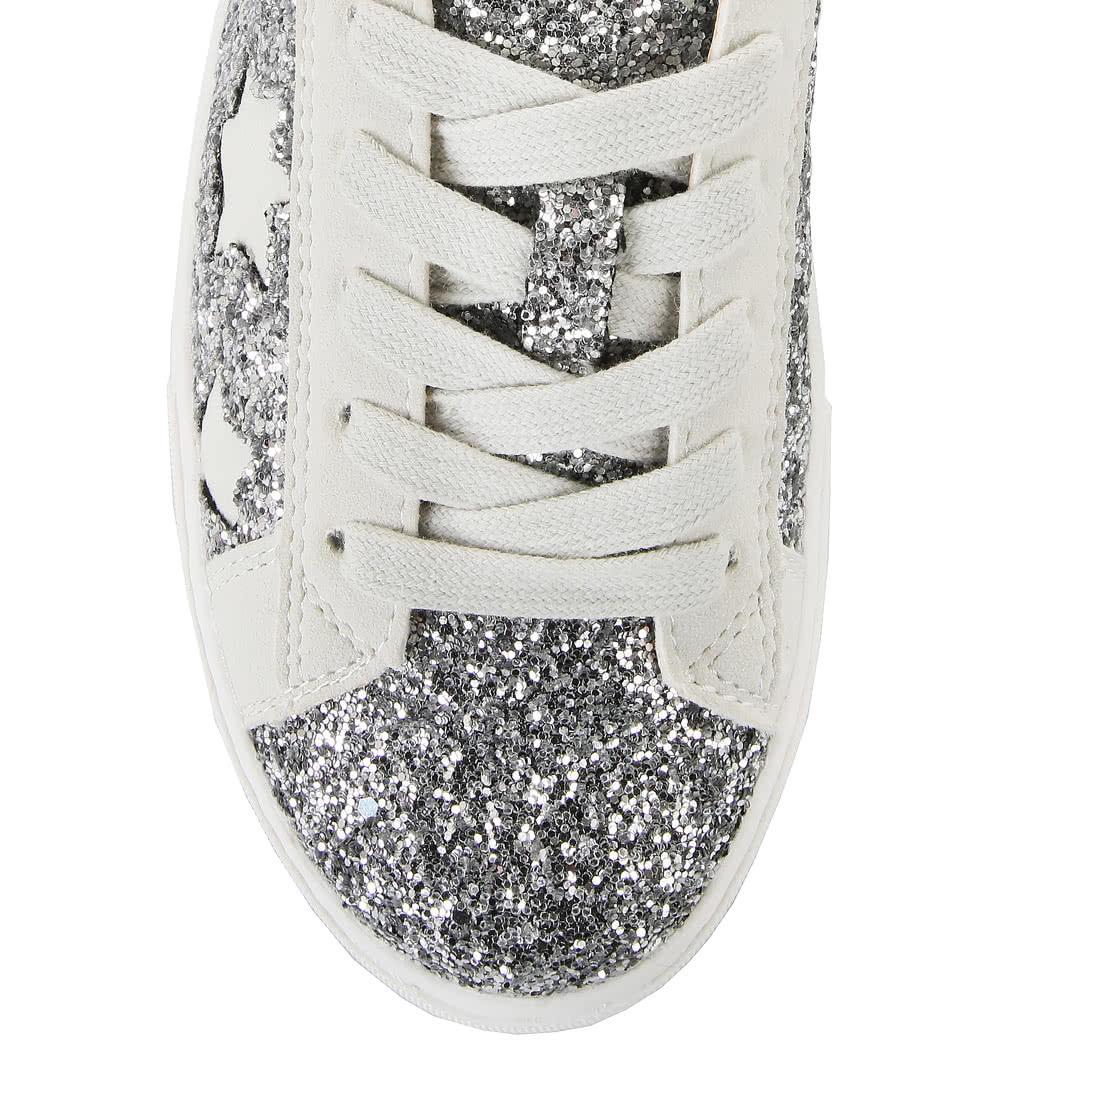 new product 37ebe 455f1 Buffalo Plateau-Sneaker in weiß/silber glitzer online kaufen ...